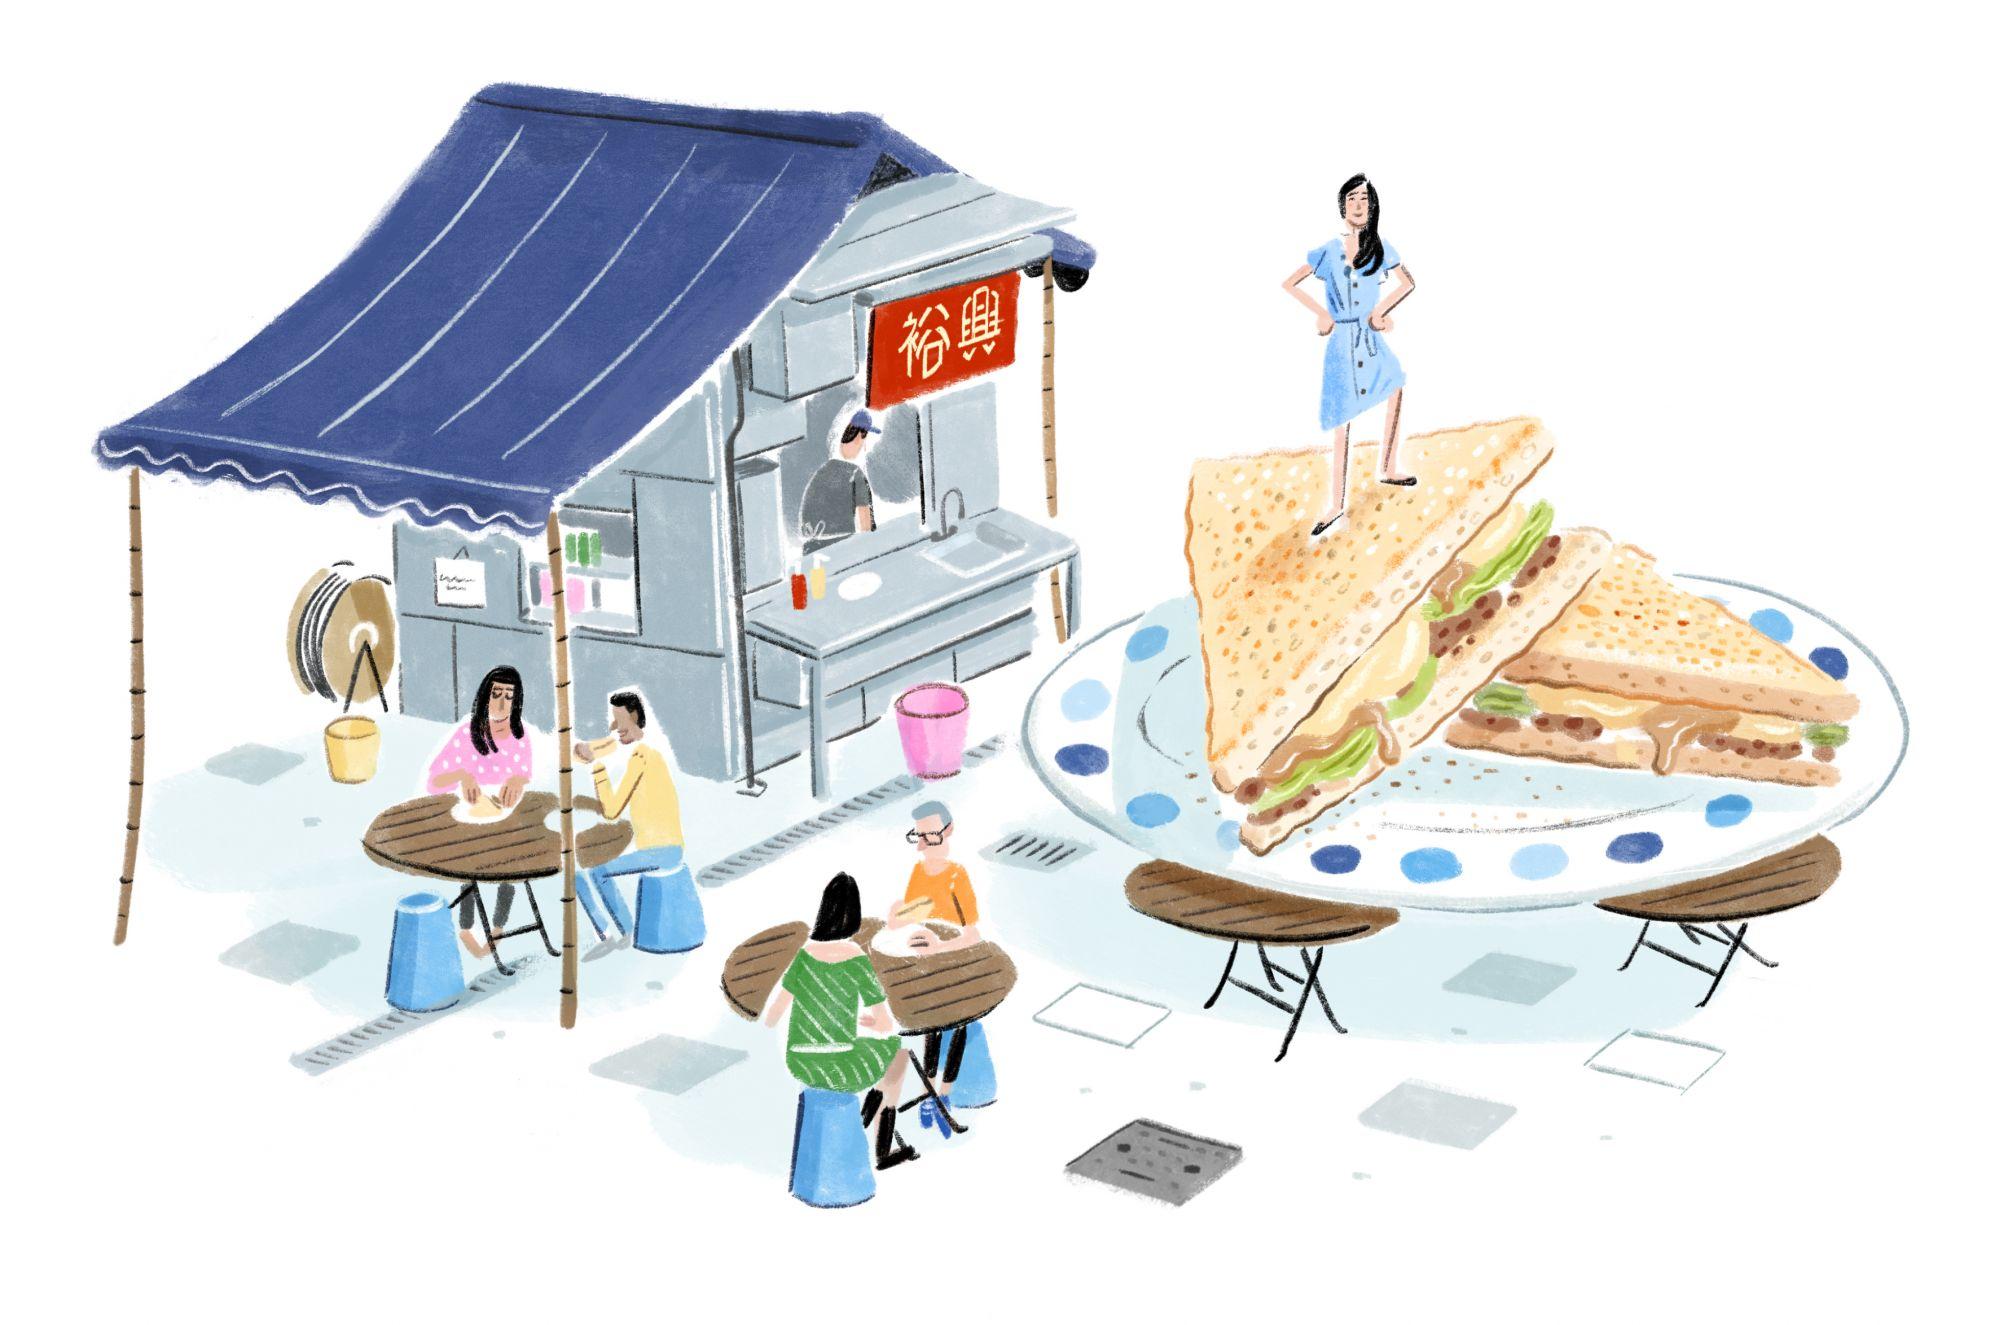 Why Hong Kong's Cha Chaan Tengs And Dai Pai Dongs Are Nana Chan's Favourite Food Experiences